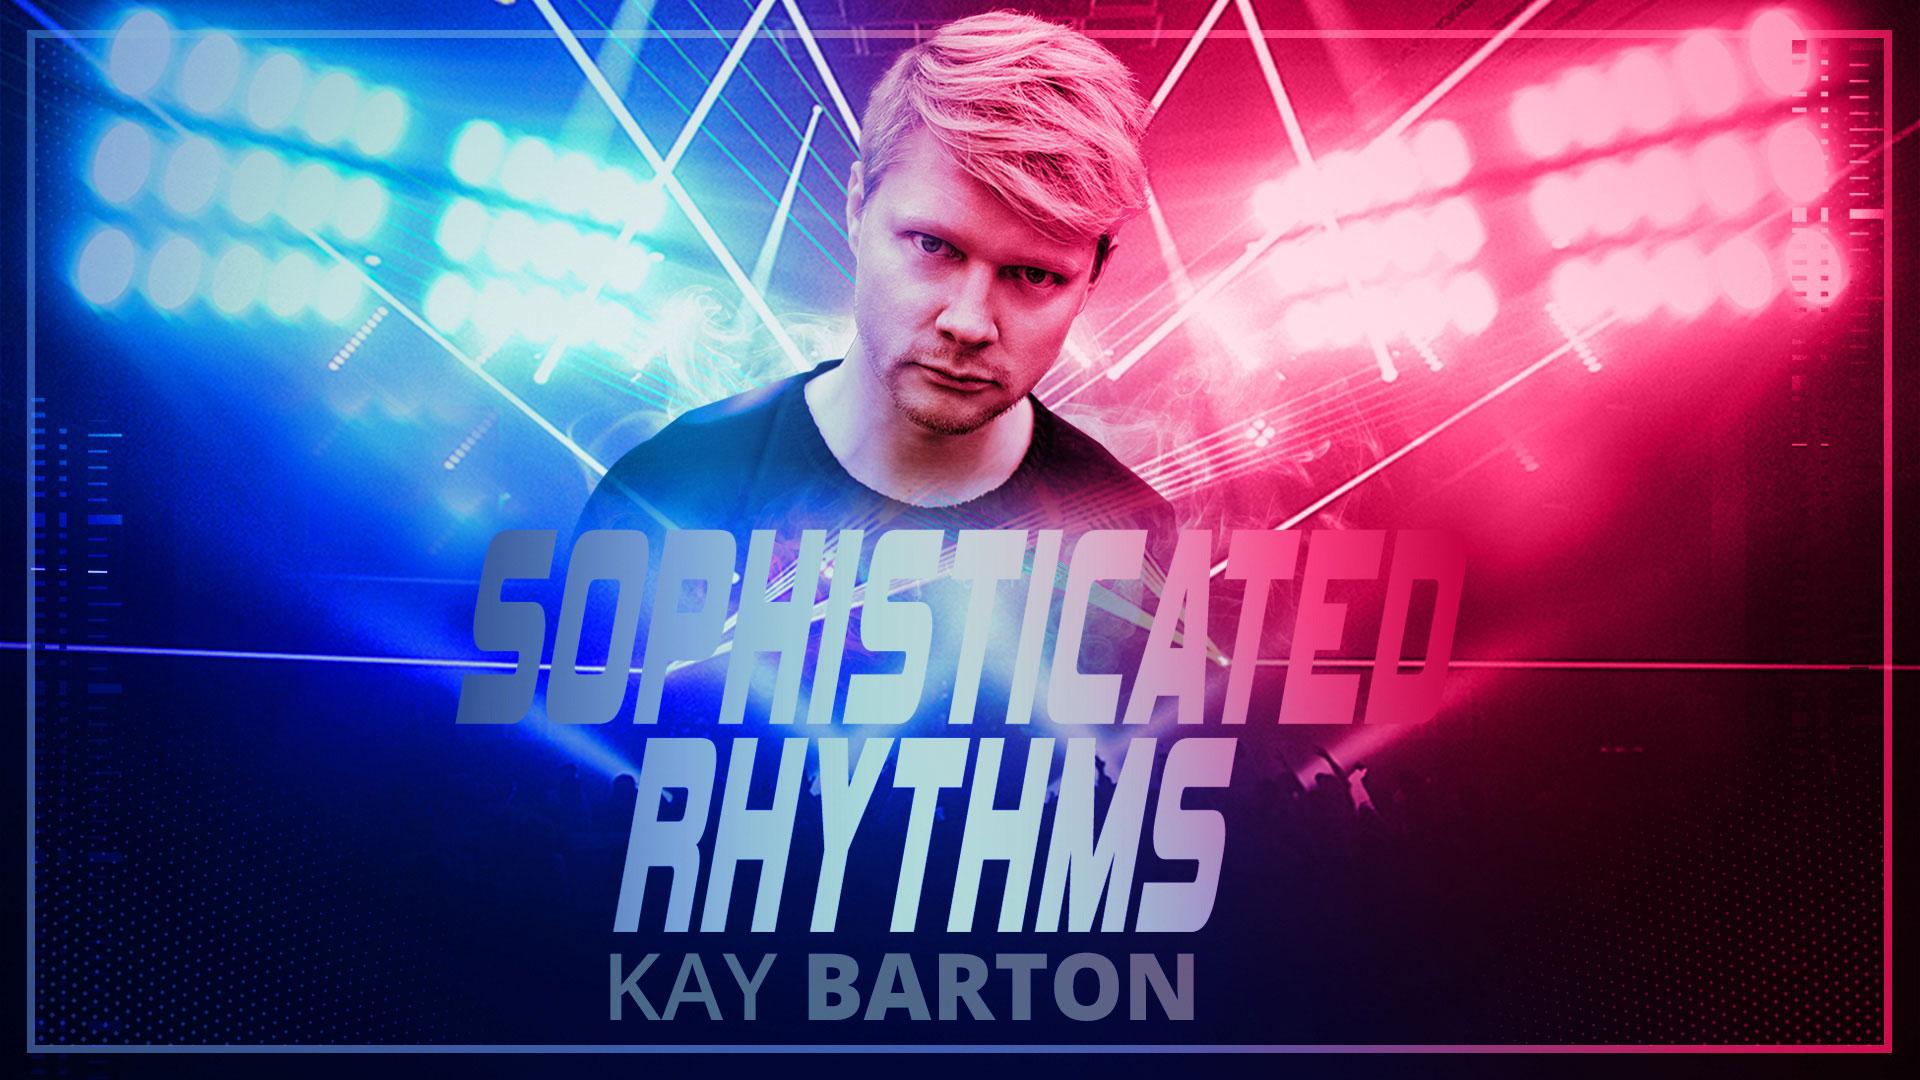 SOPHISTICATED RHYTHMS mit KAY BARTON